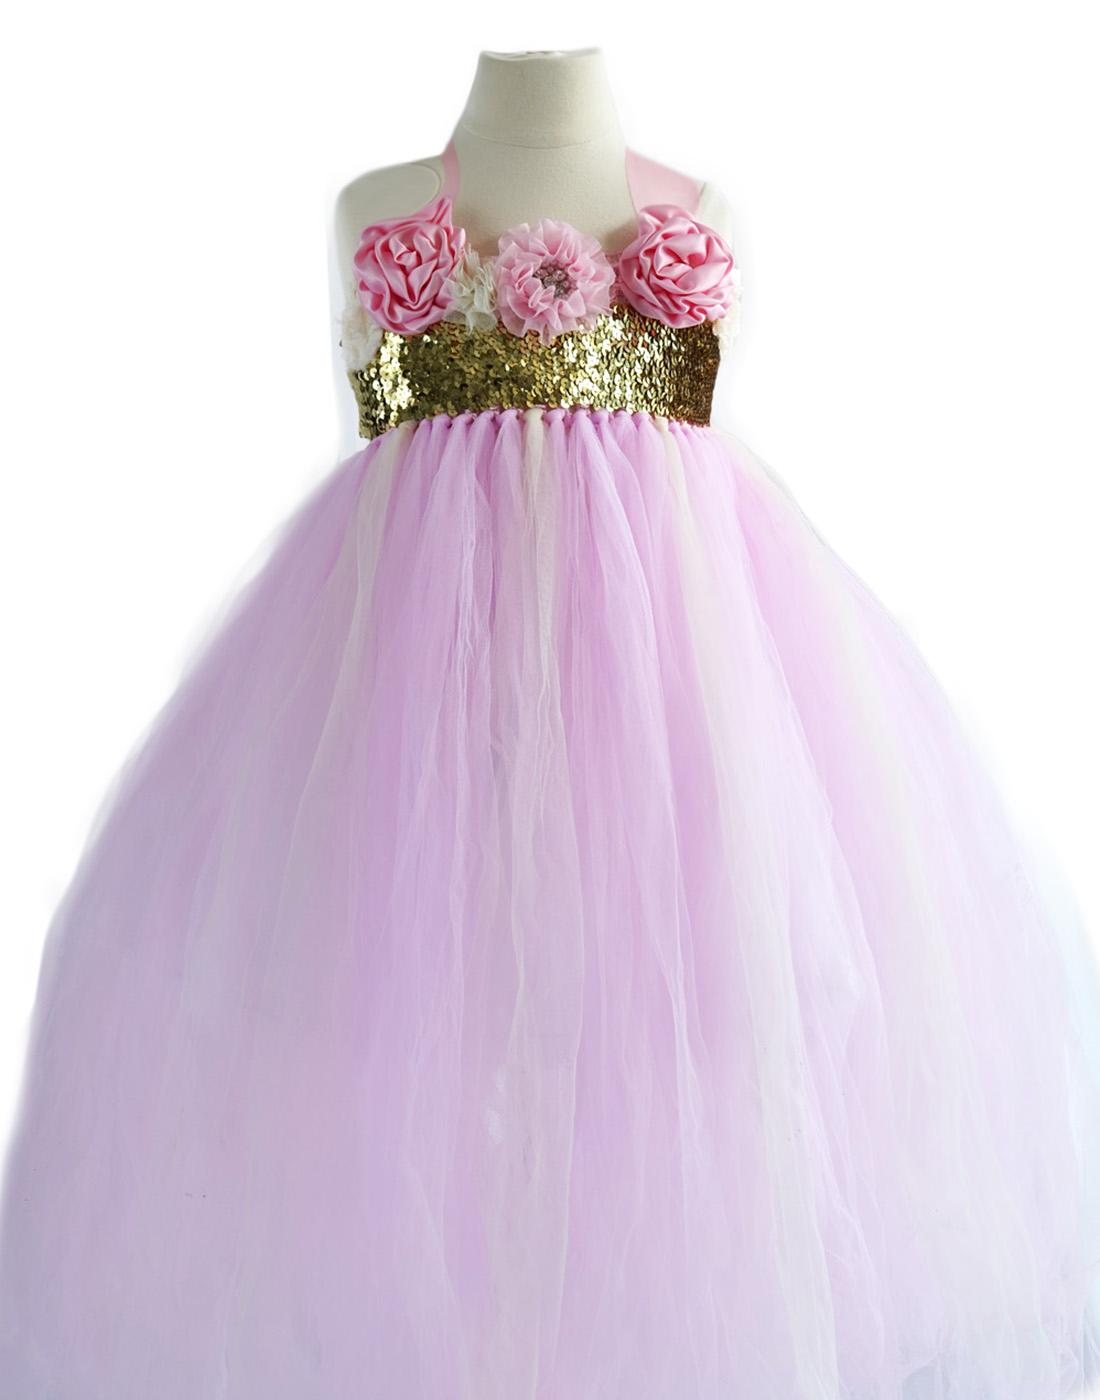 Shimmering Gold And Pink Blossomy Tulle Flower Girl Dress Wedding